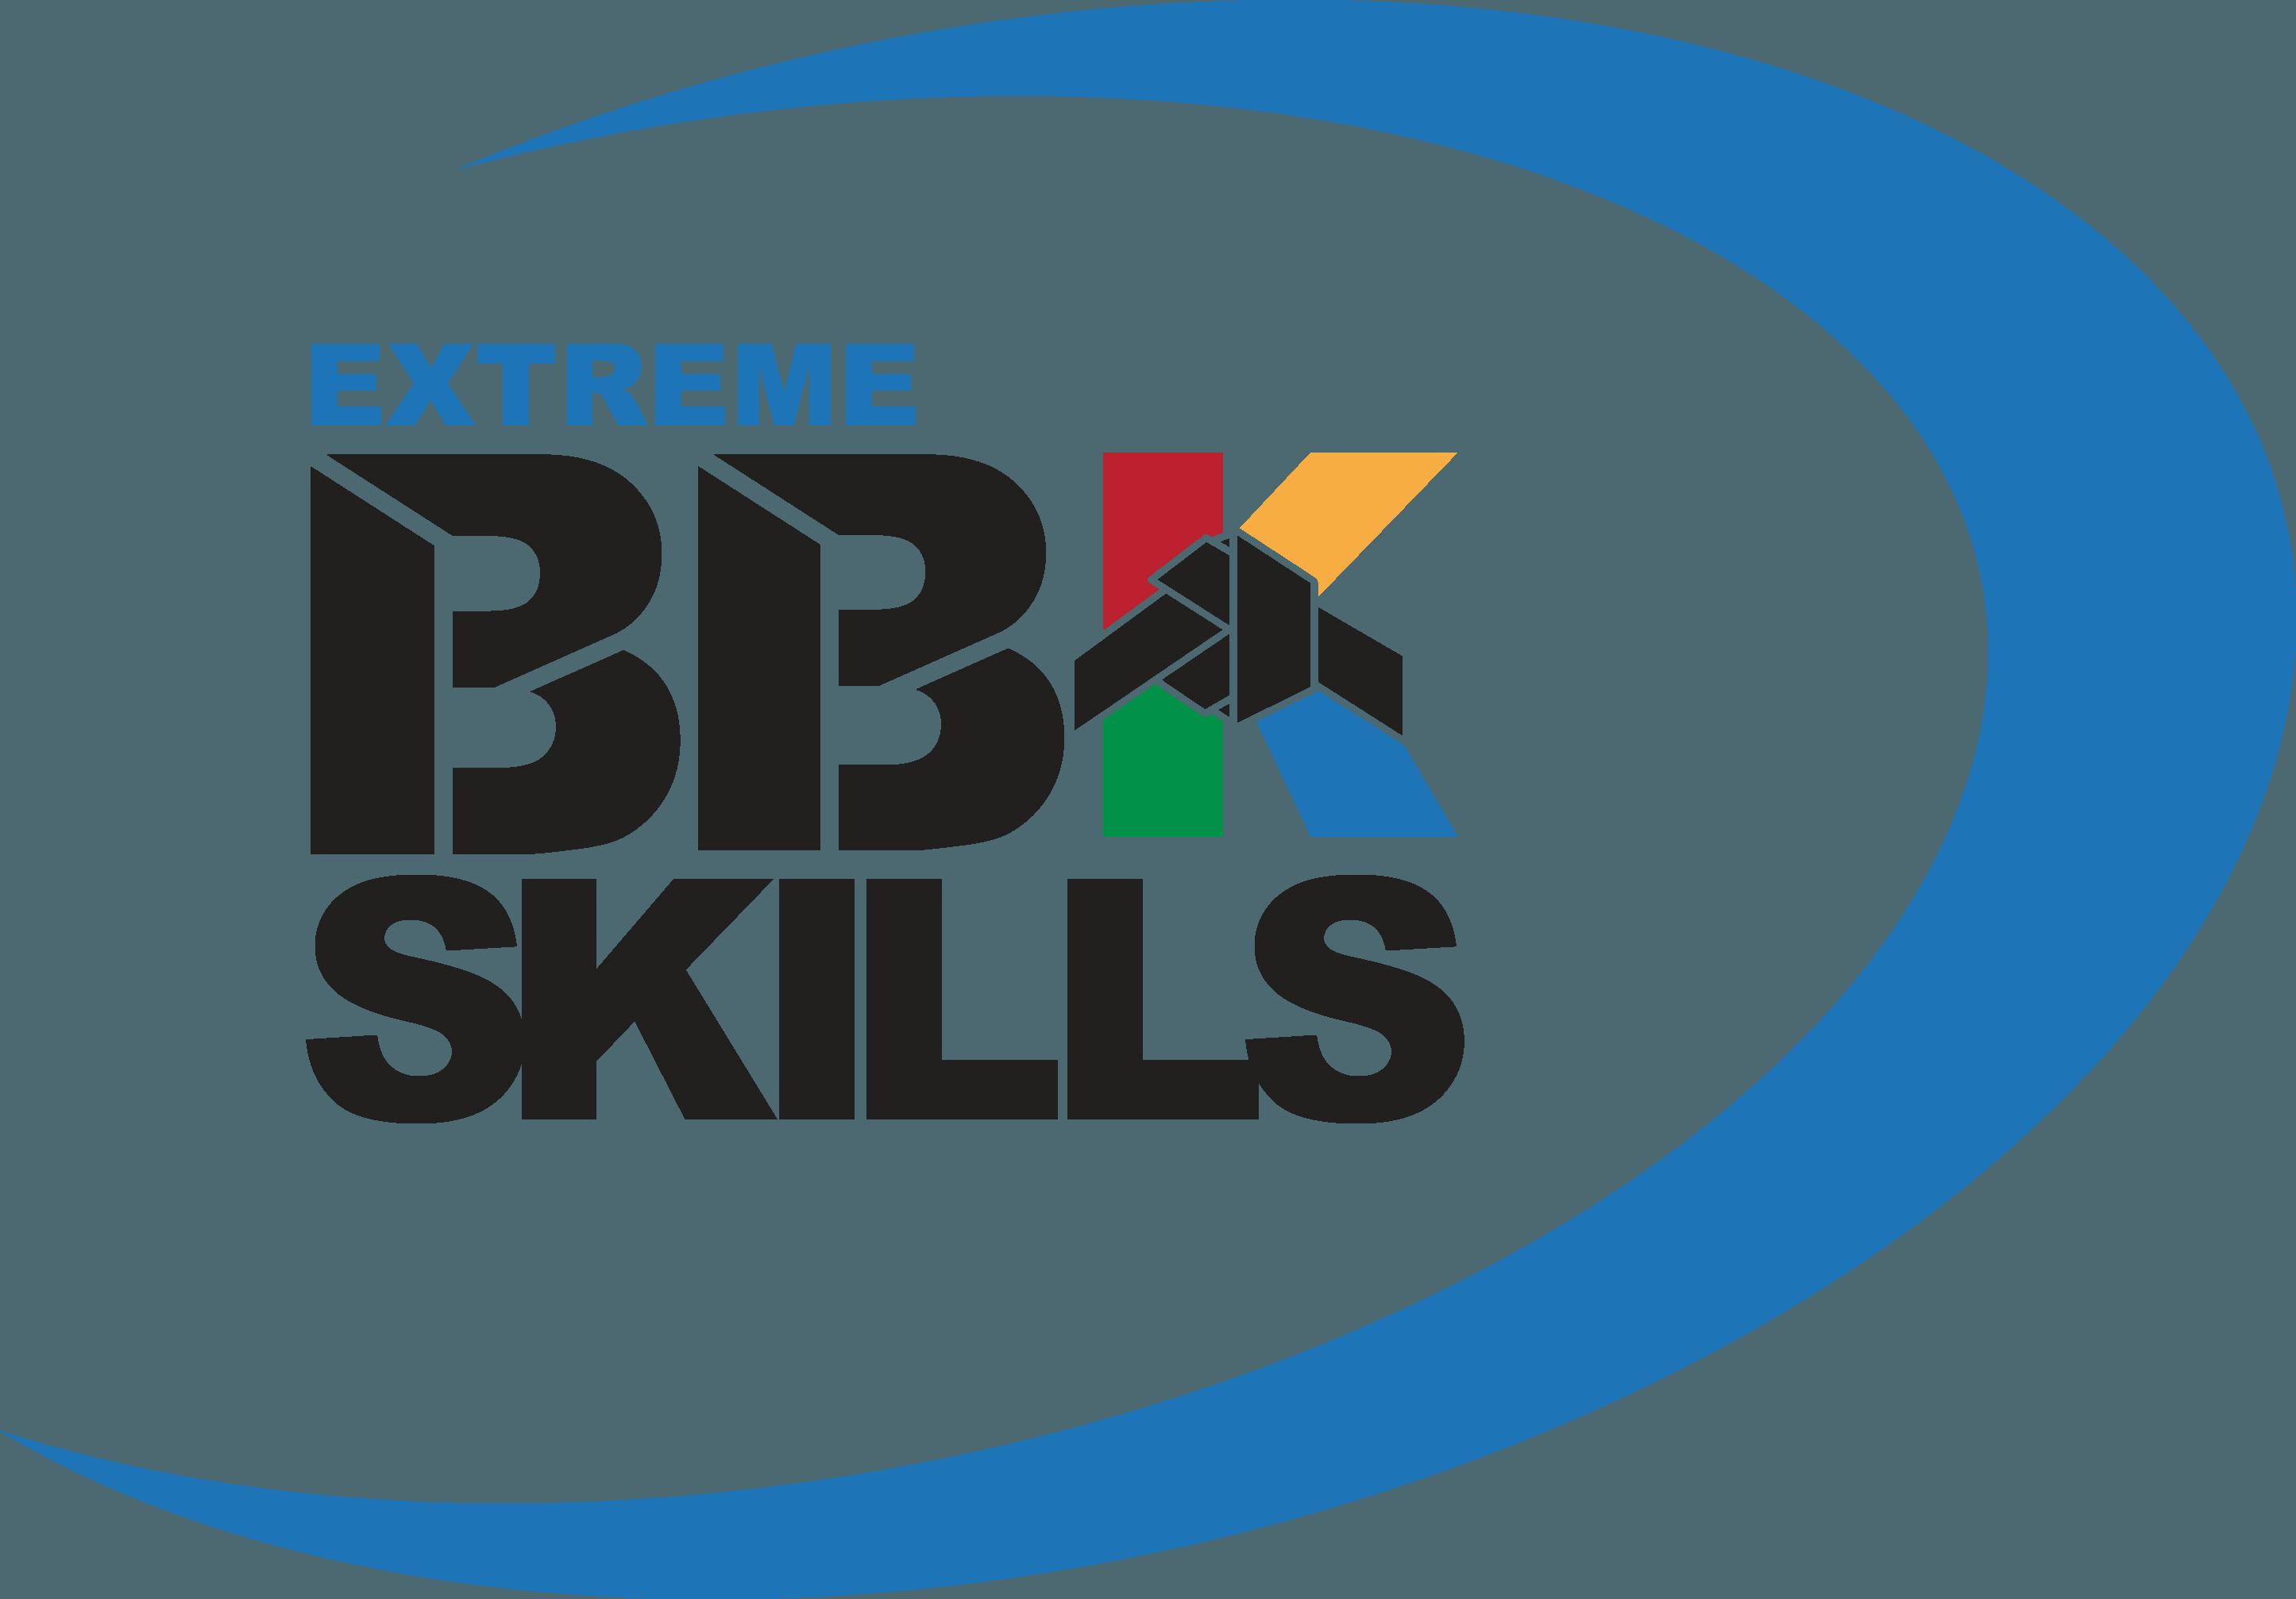 SkillsLogos_Extreme